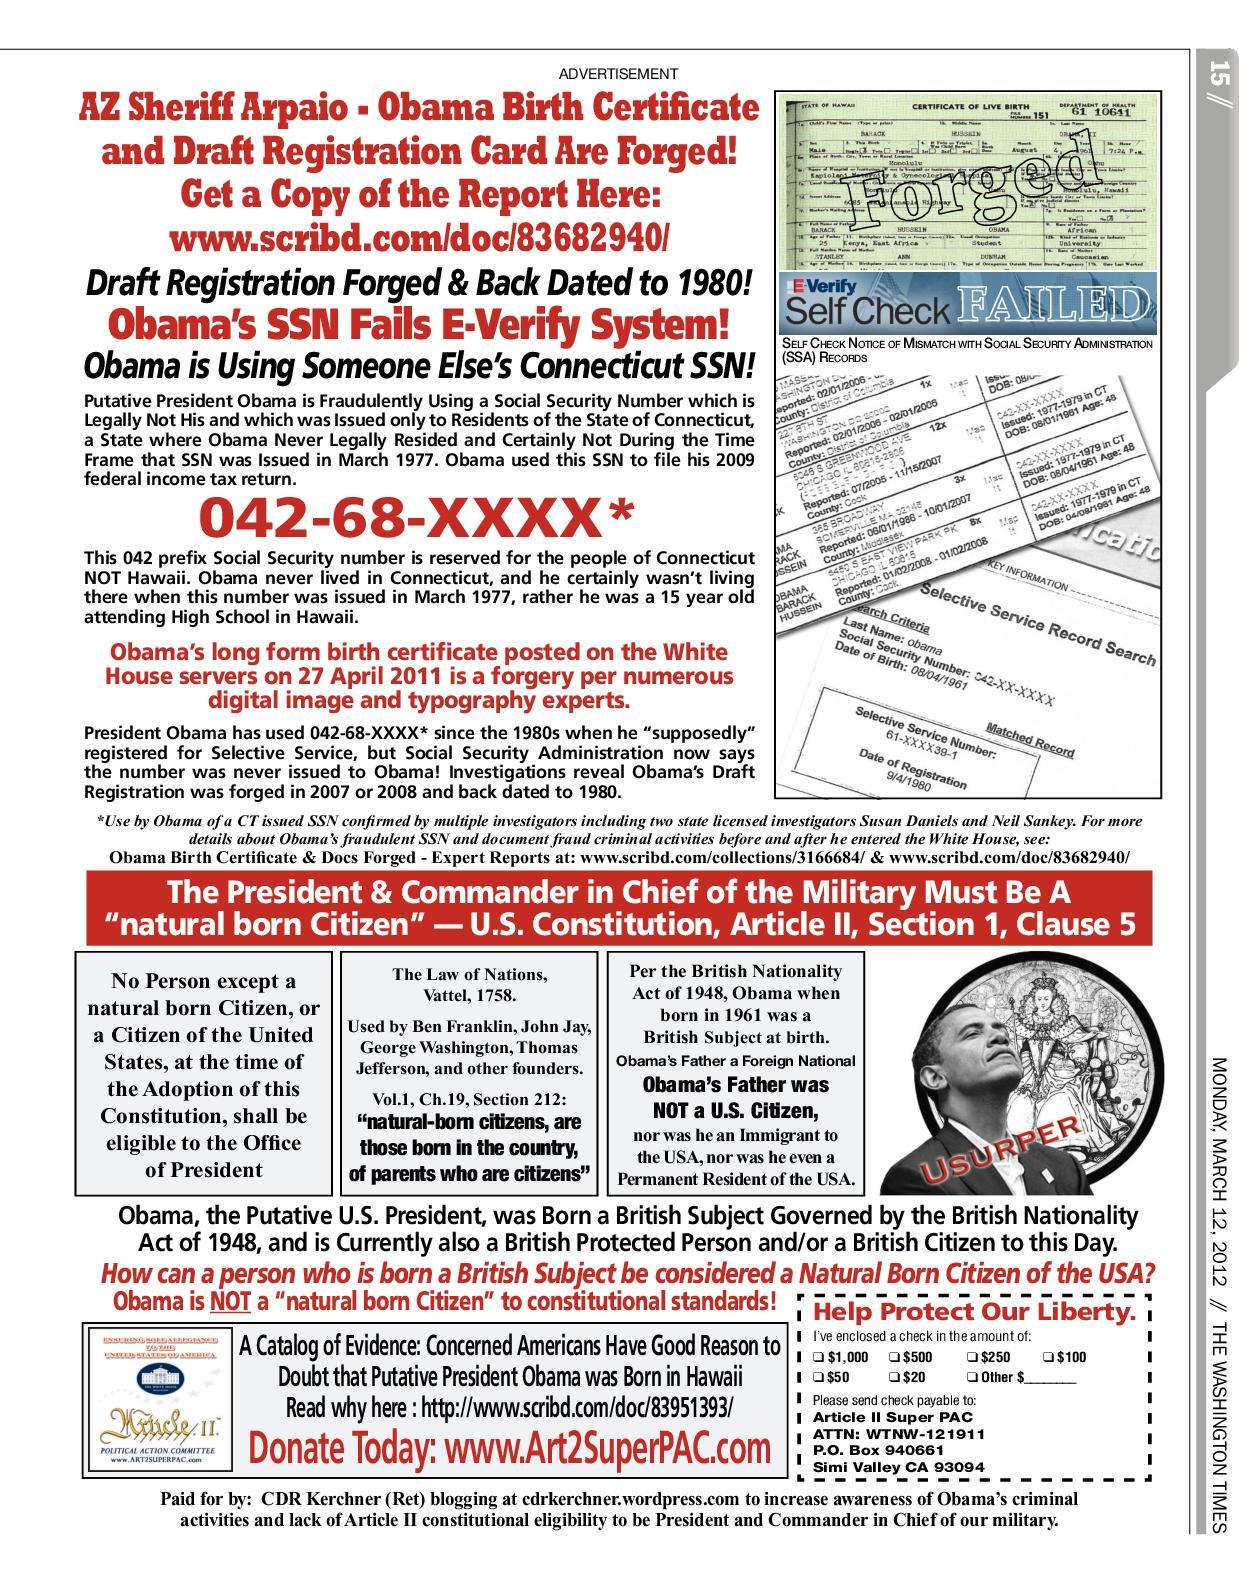 Calamo Az Sheriff Arpaio Says Obama Birth Cert And Draft Reg Card